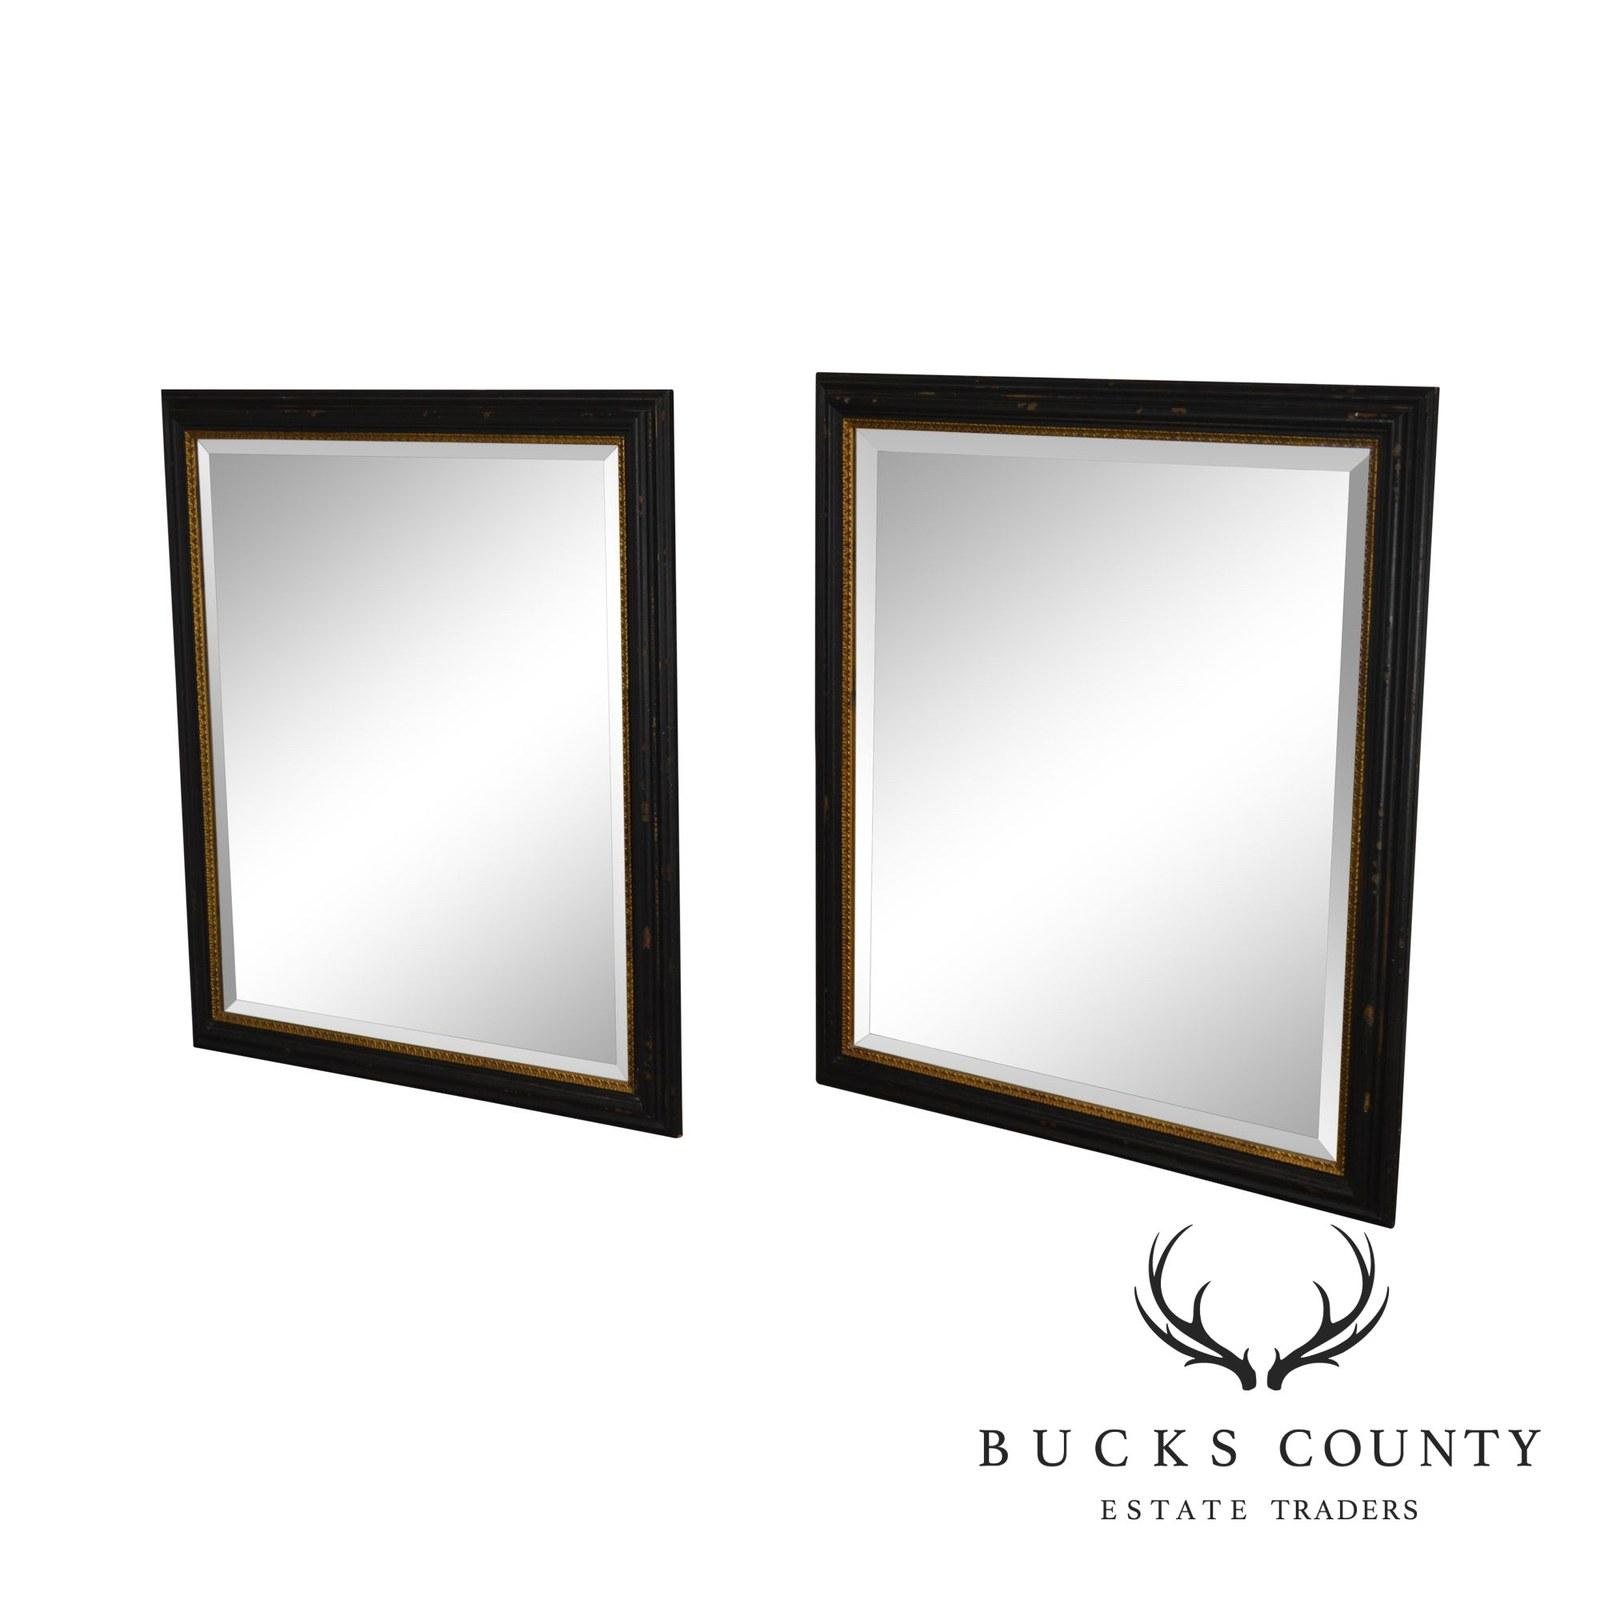 Regency Style Distressed Black & Gold Frame Rectangular Pair Beveled Mirrors - $1,195.00